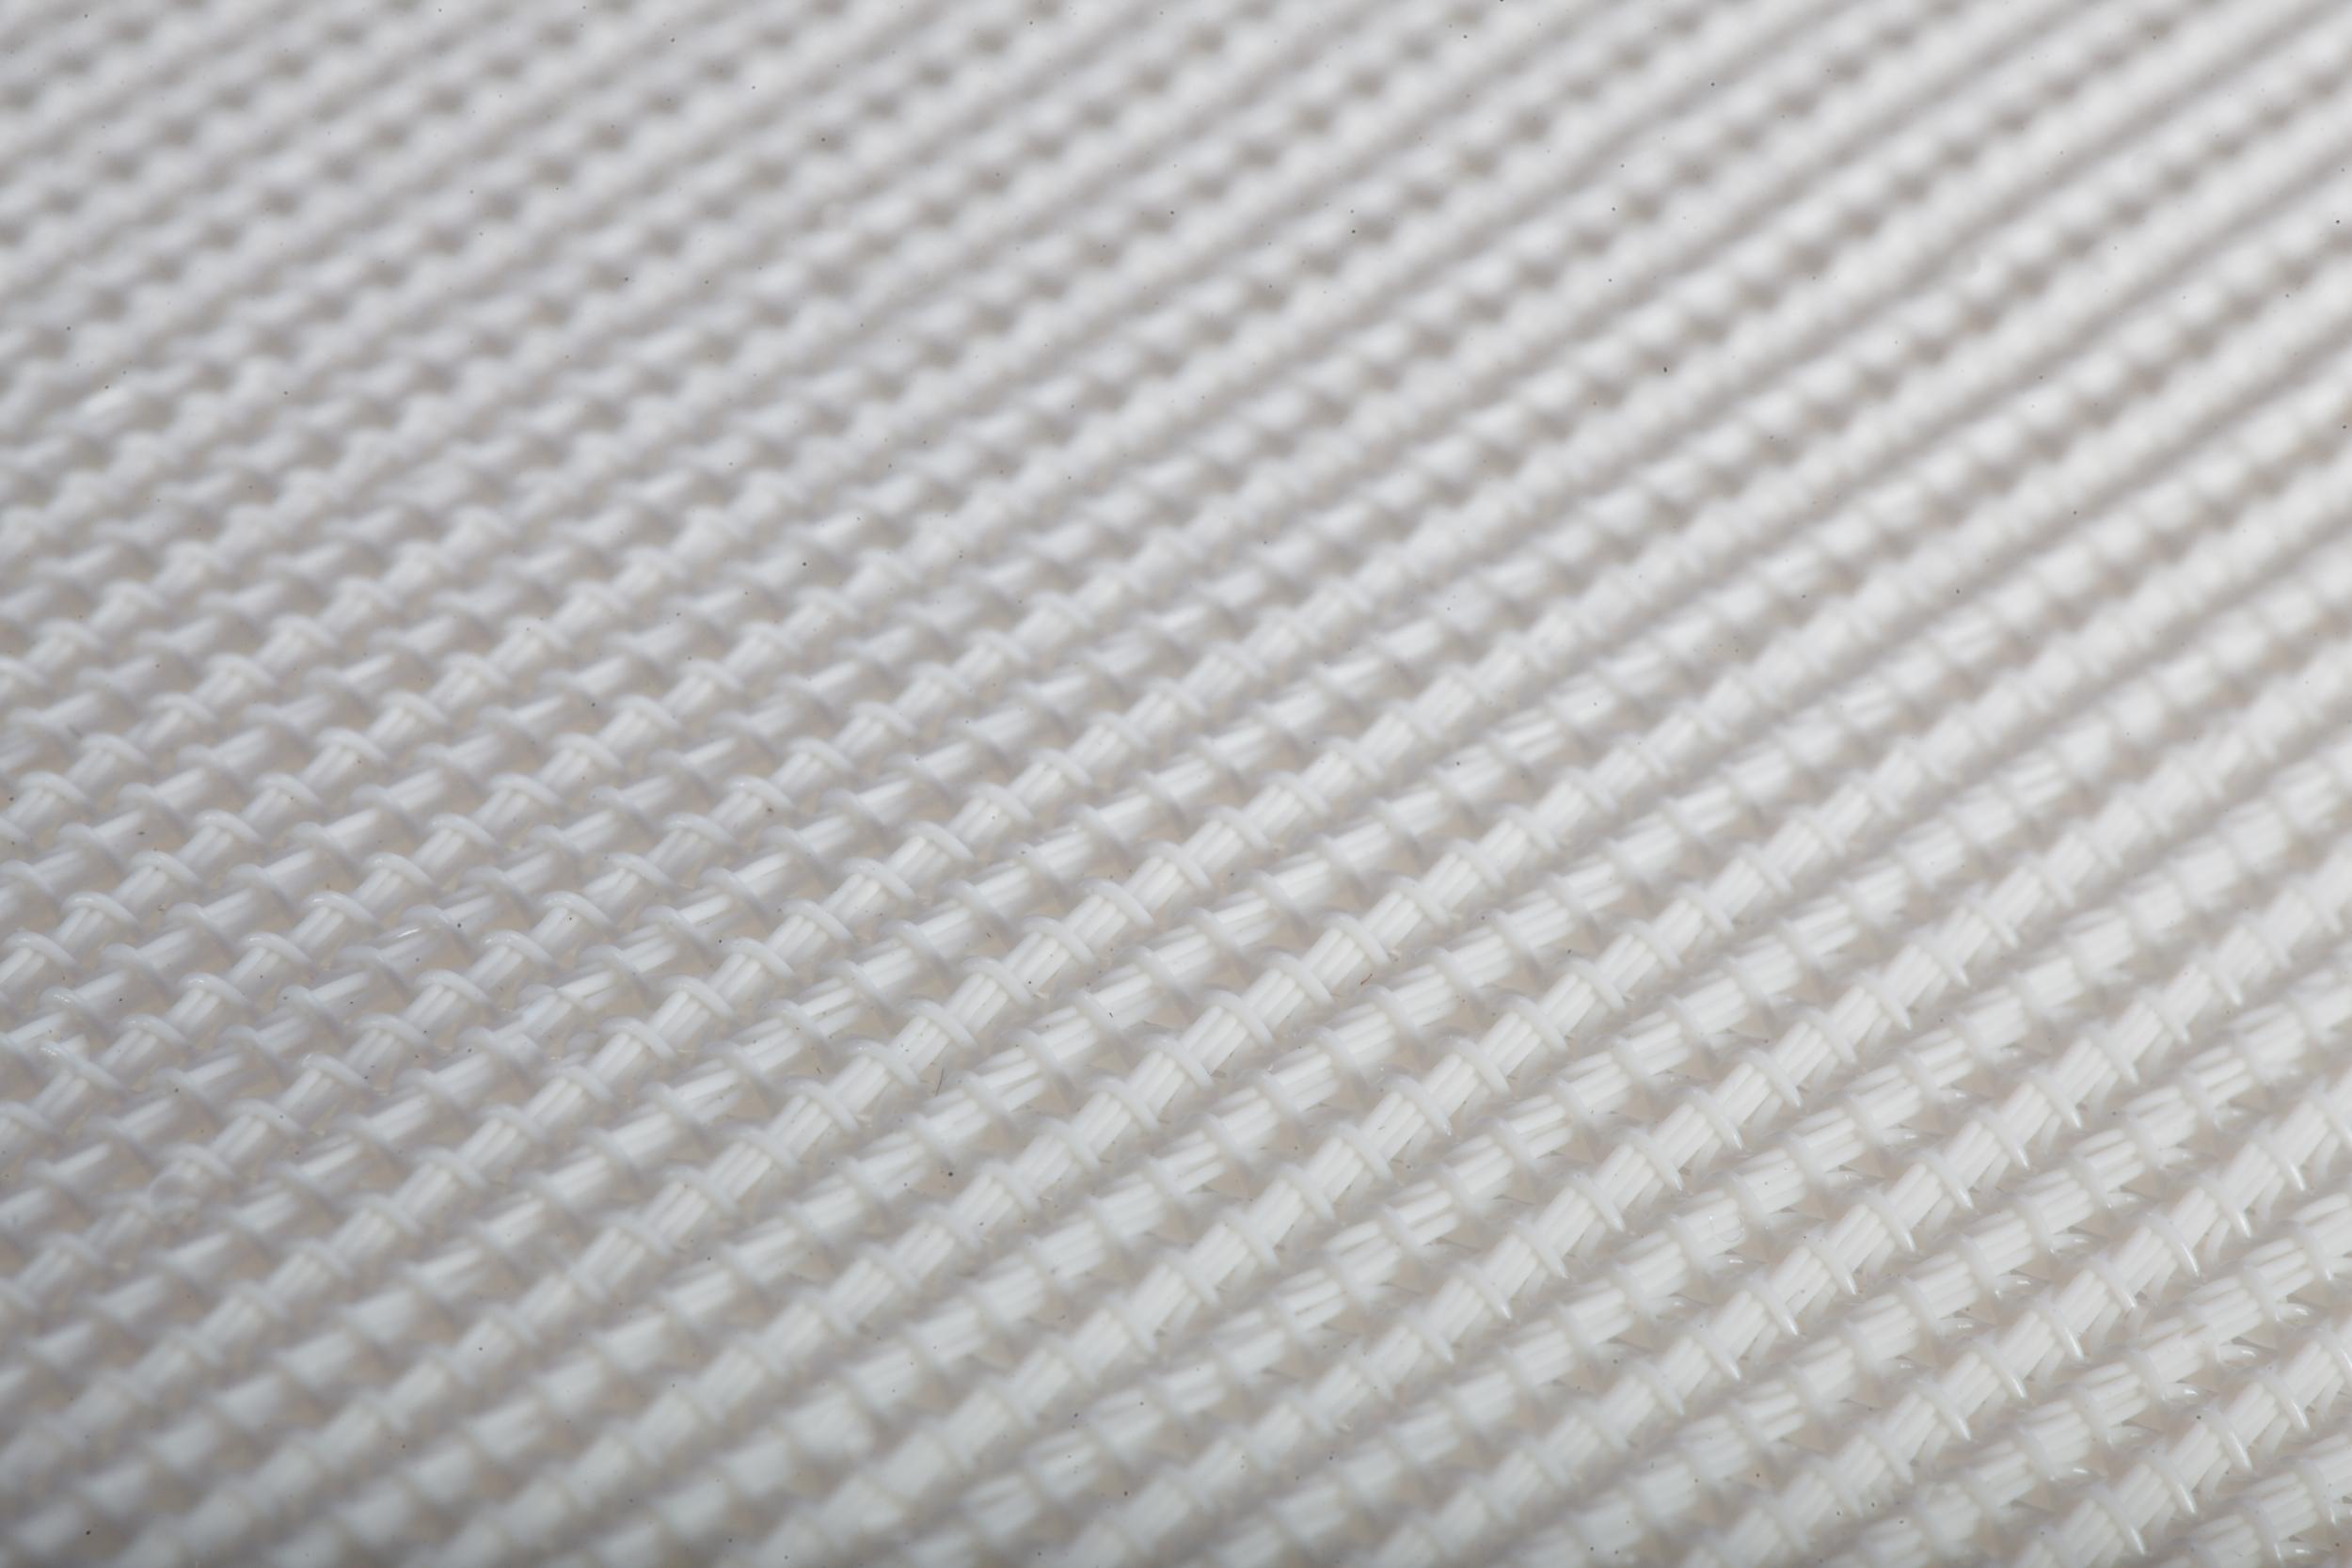 mm fabric Mesh pp.jpg